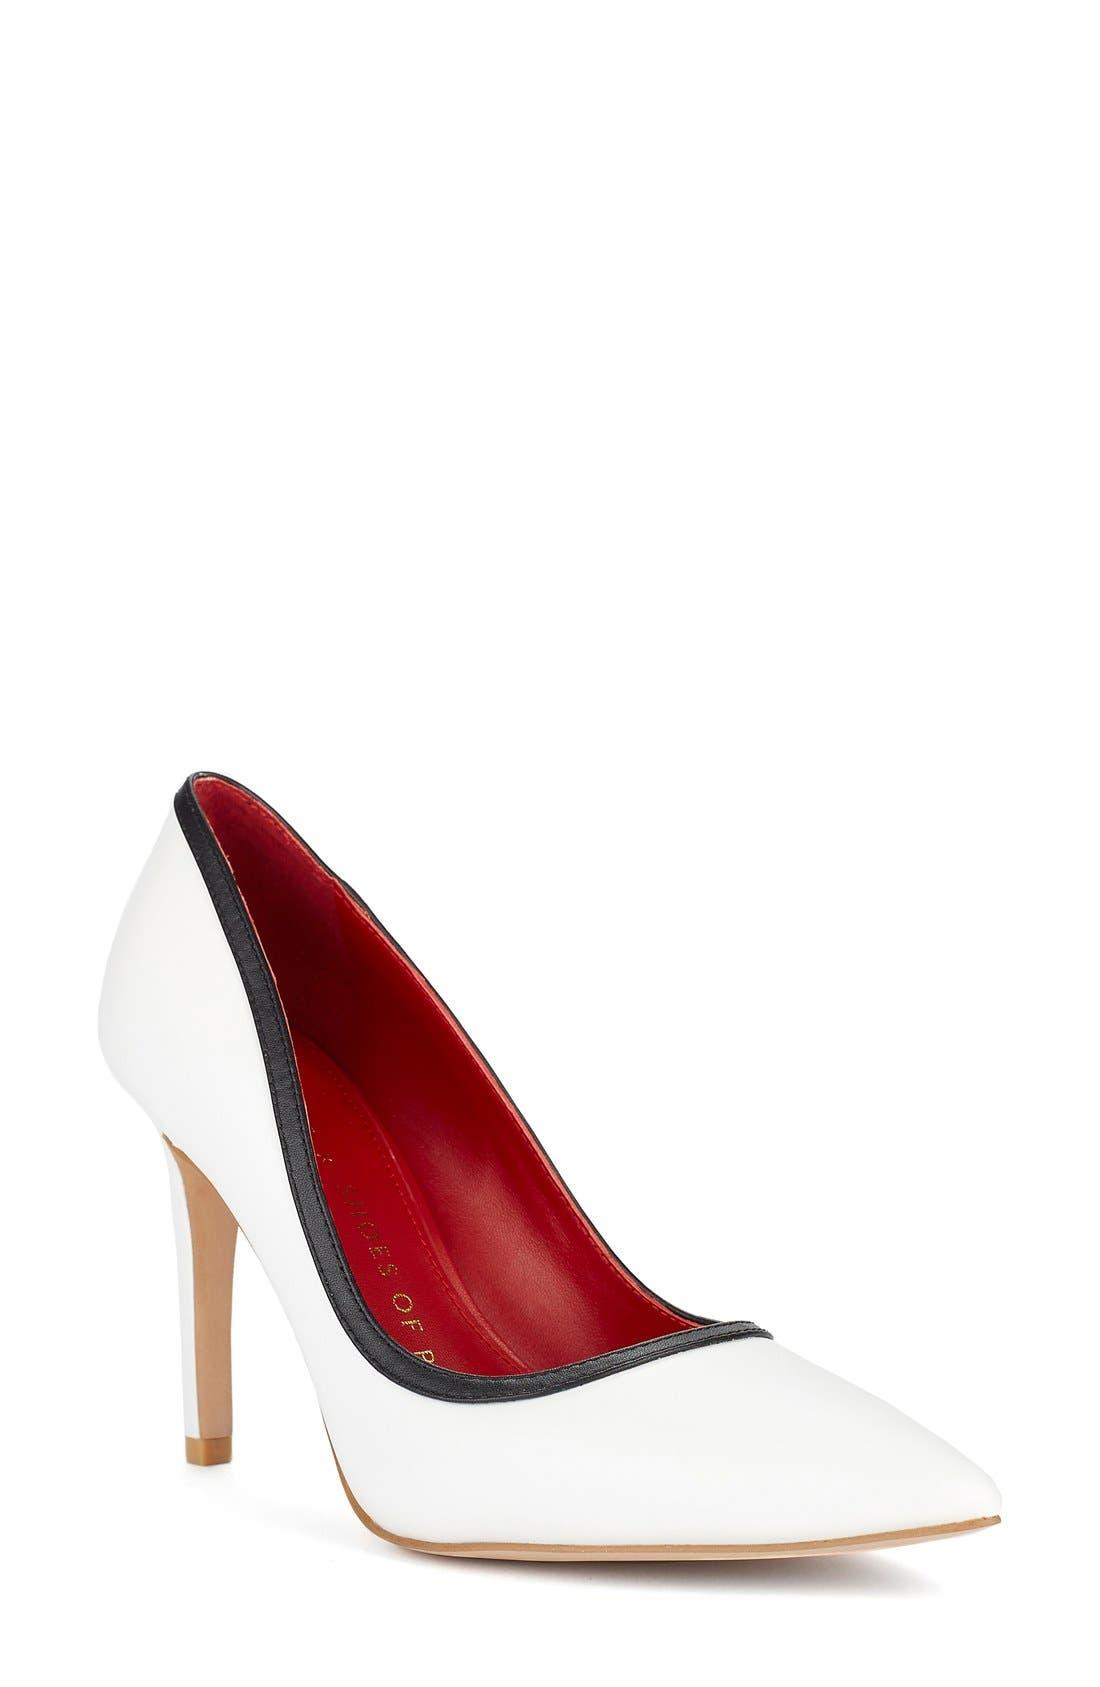 Alternate Image 1 Selected - Shoes of Prey x Kim Jones La Dolce Vita Collection Pointy Toe Pump (Women)